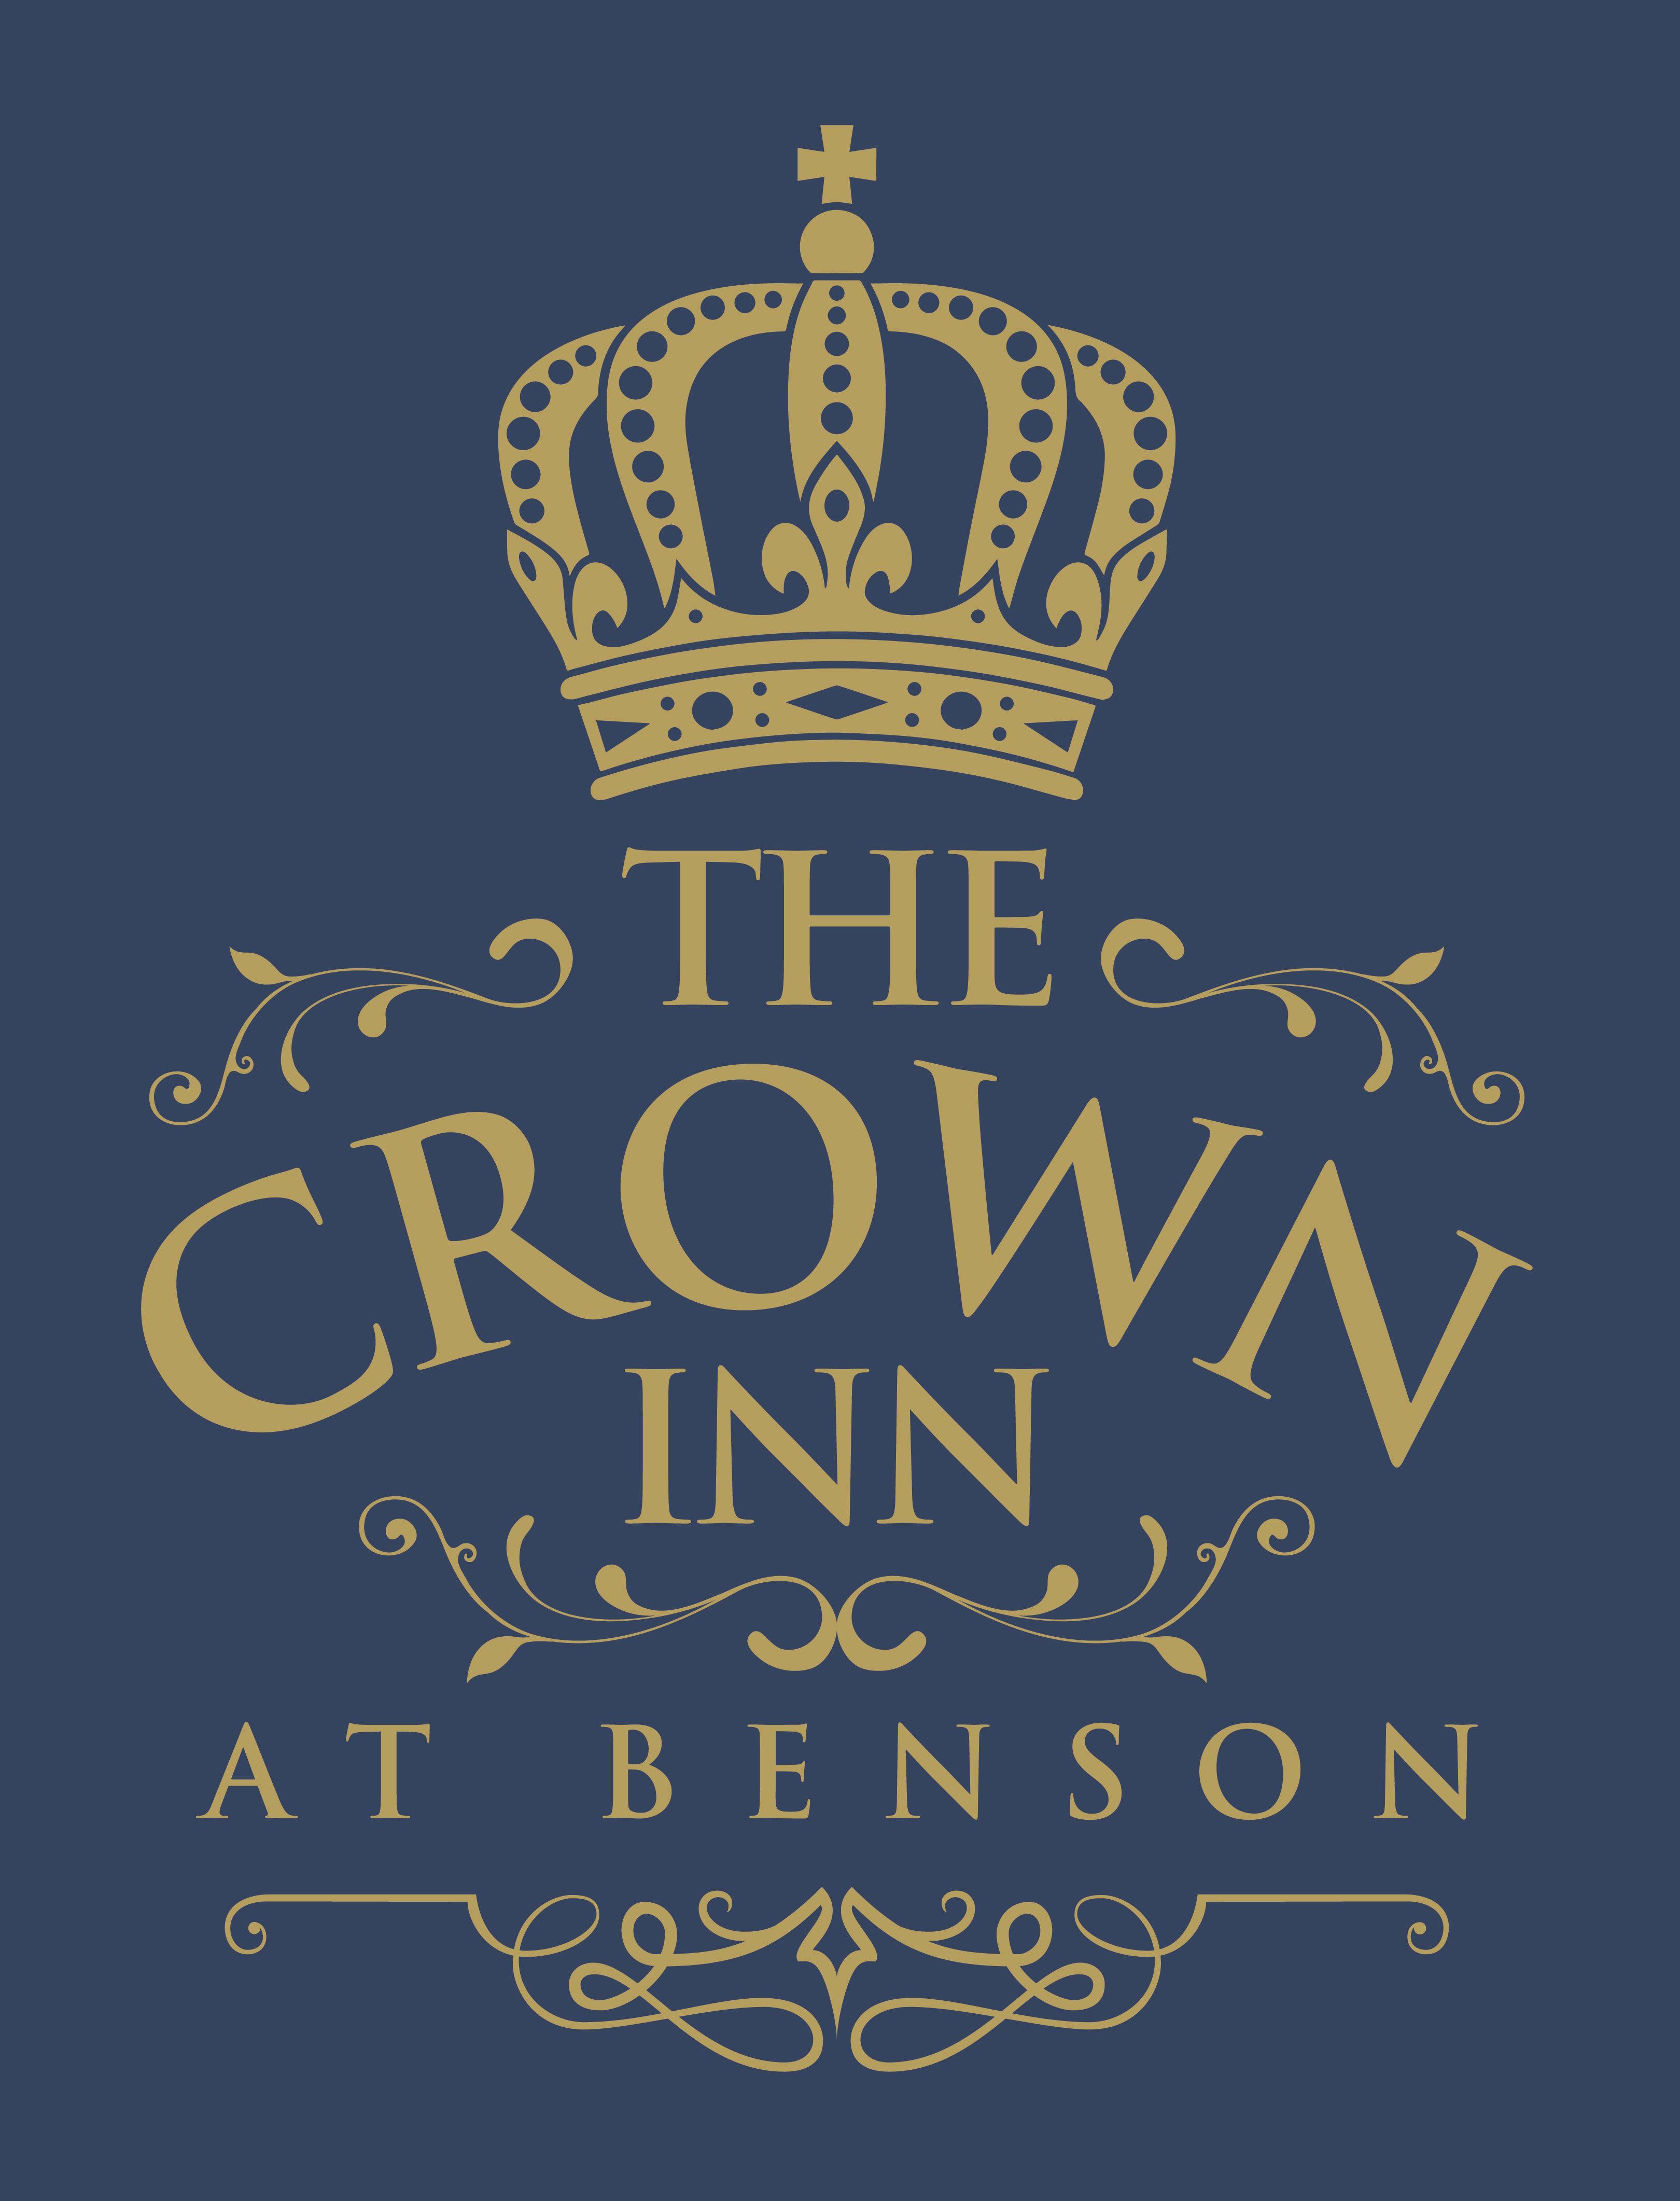 The Crown Pub sign 1068mm x 813mm 5mm bleed 2 kyirmy